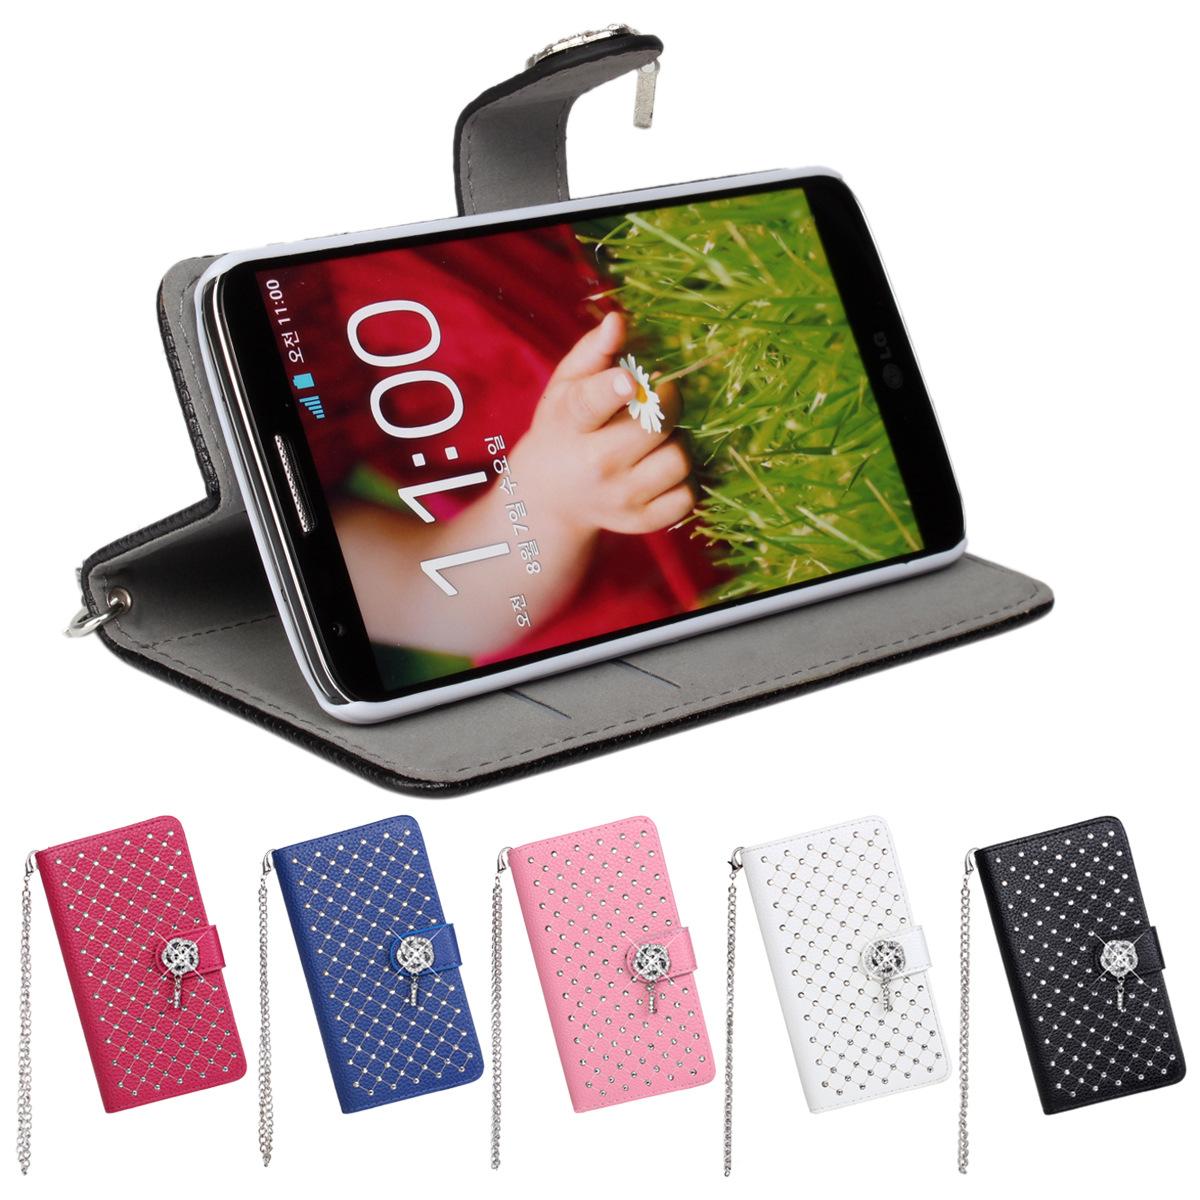 Glitter Bling Rhinestone Cases for LG G2 Flip Leather Cover for LG G2(China (Mainland))